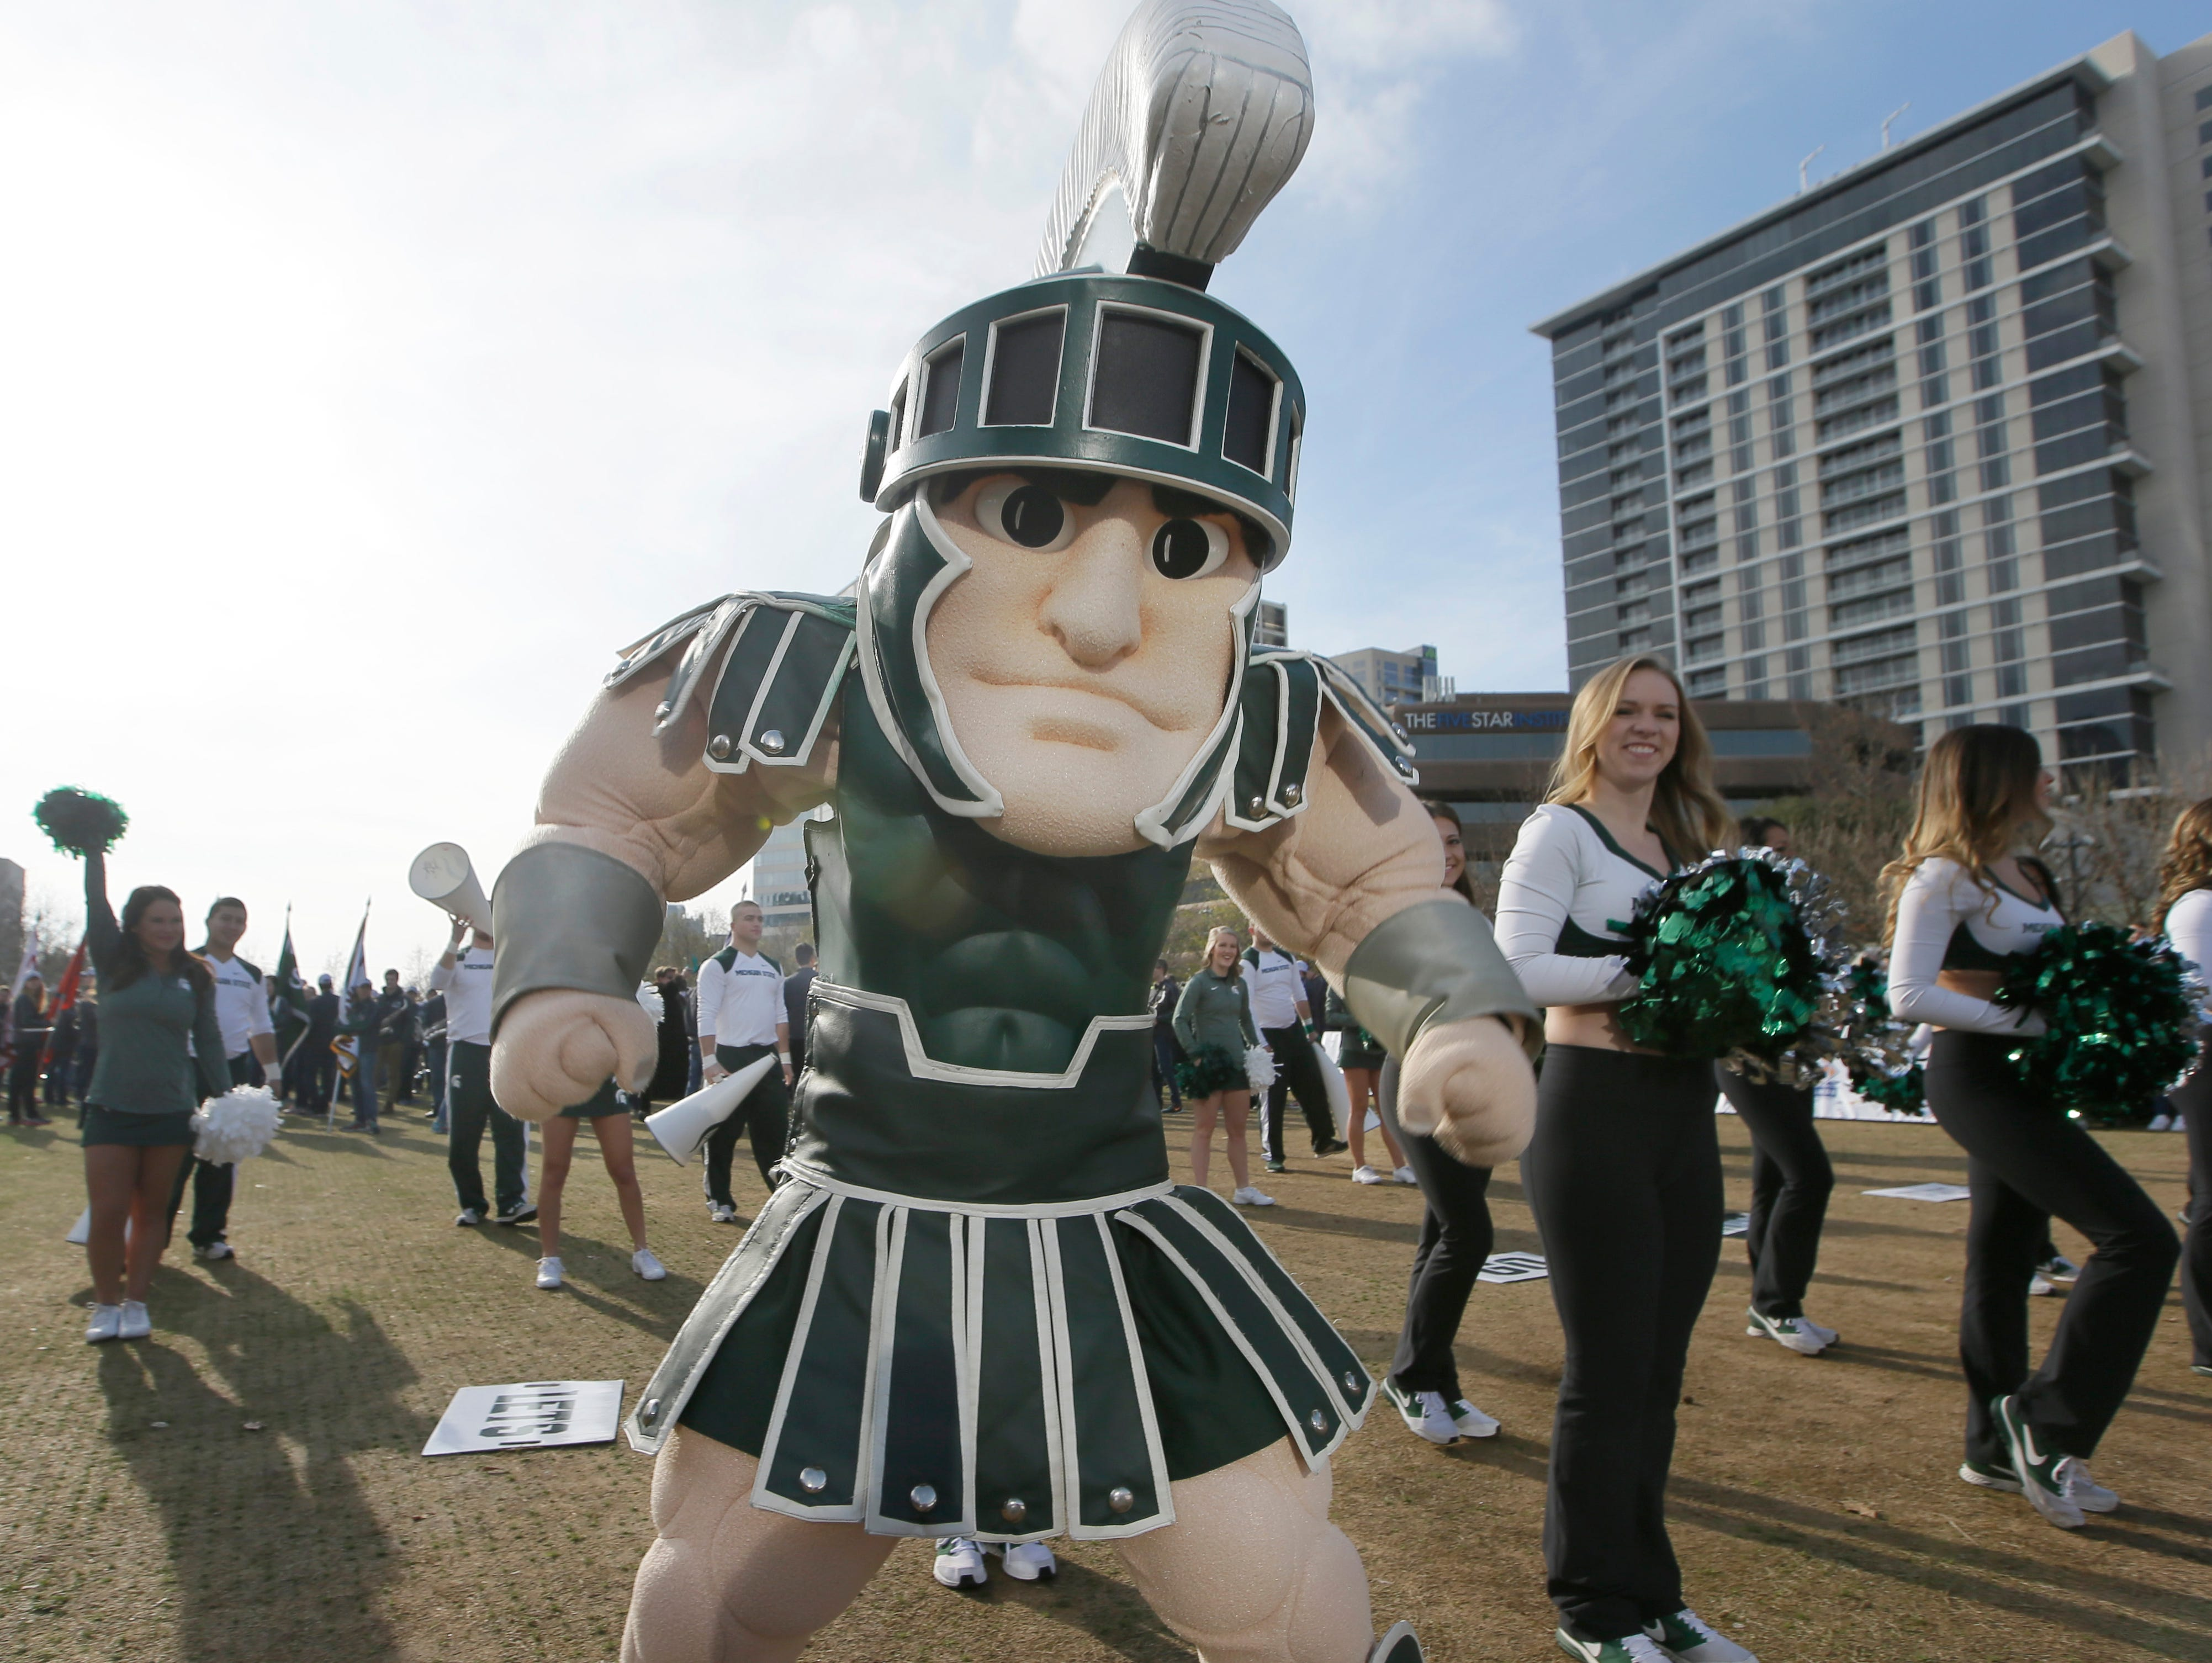 Michigan State mascot Sparty